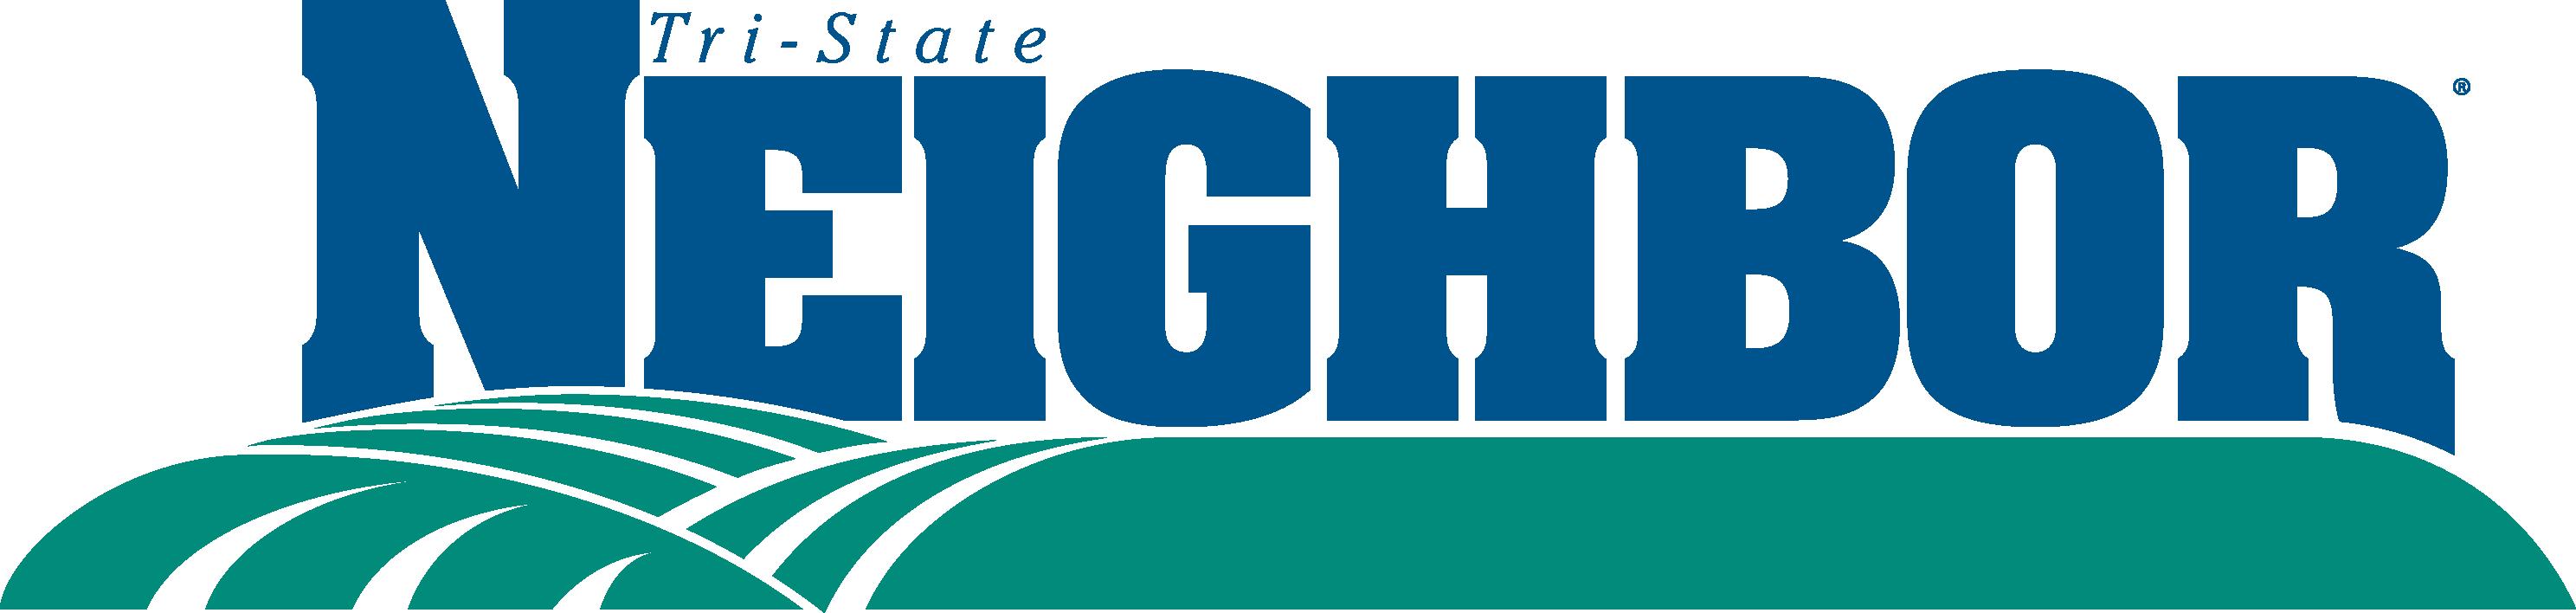 Tri-State Neighbor